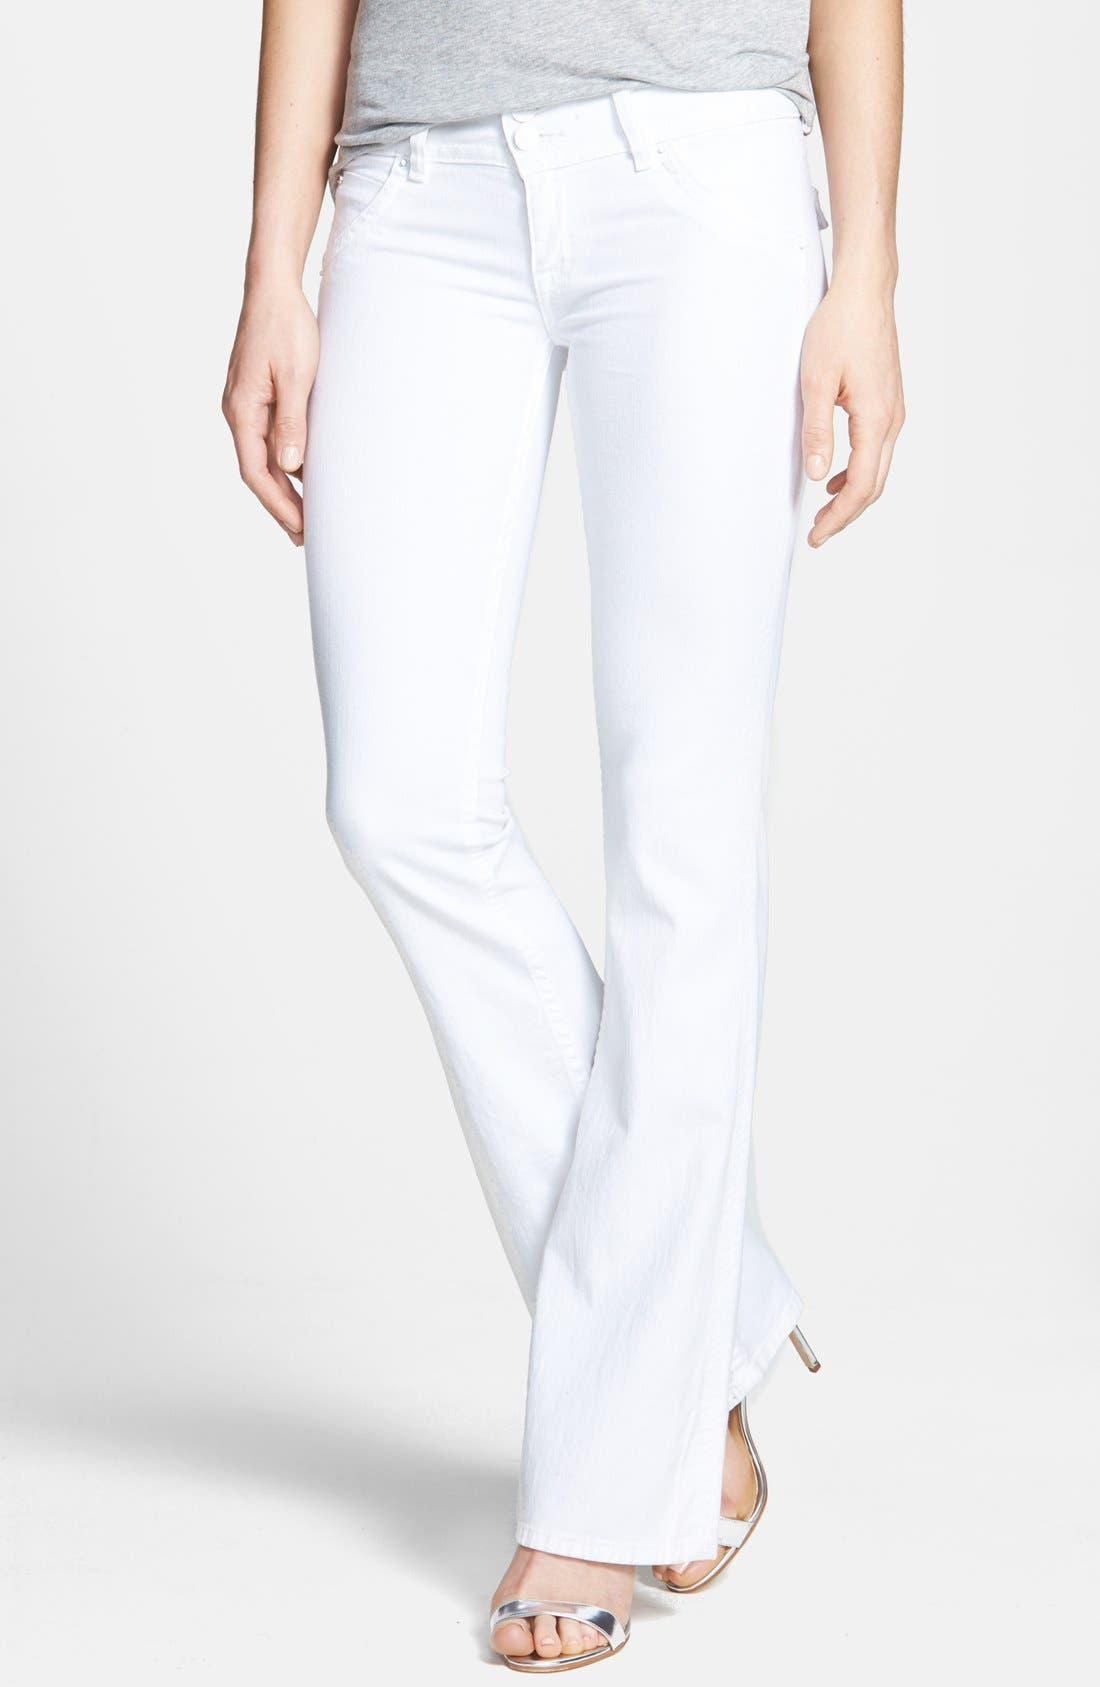 Main Image - Hudson Jeans Signature Flap Pocket Bootcut Stretch Jeans (White)